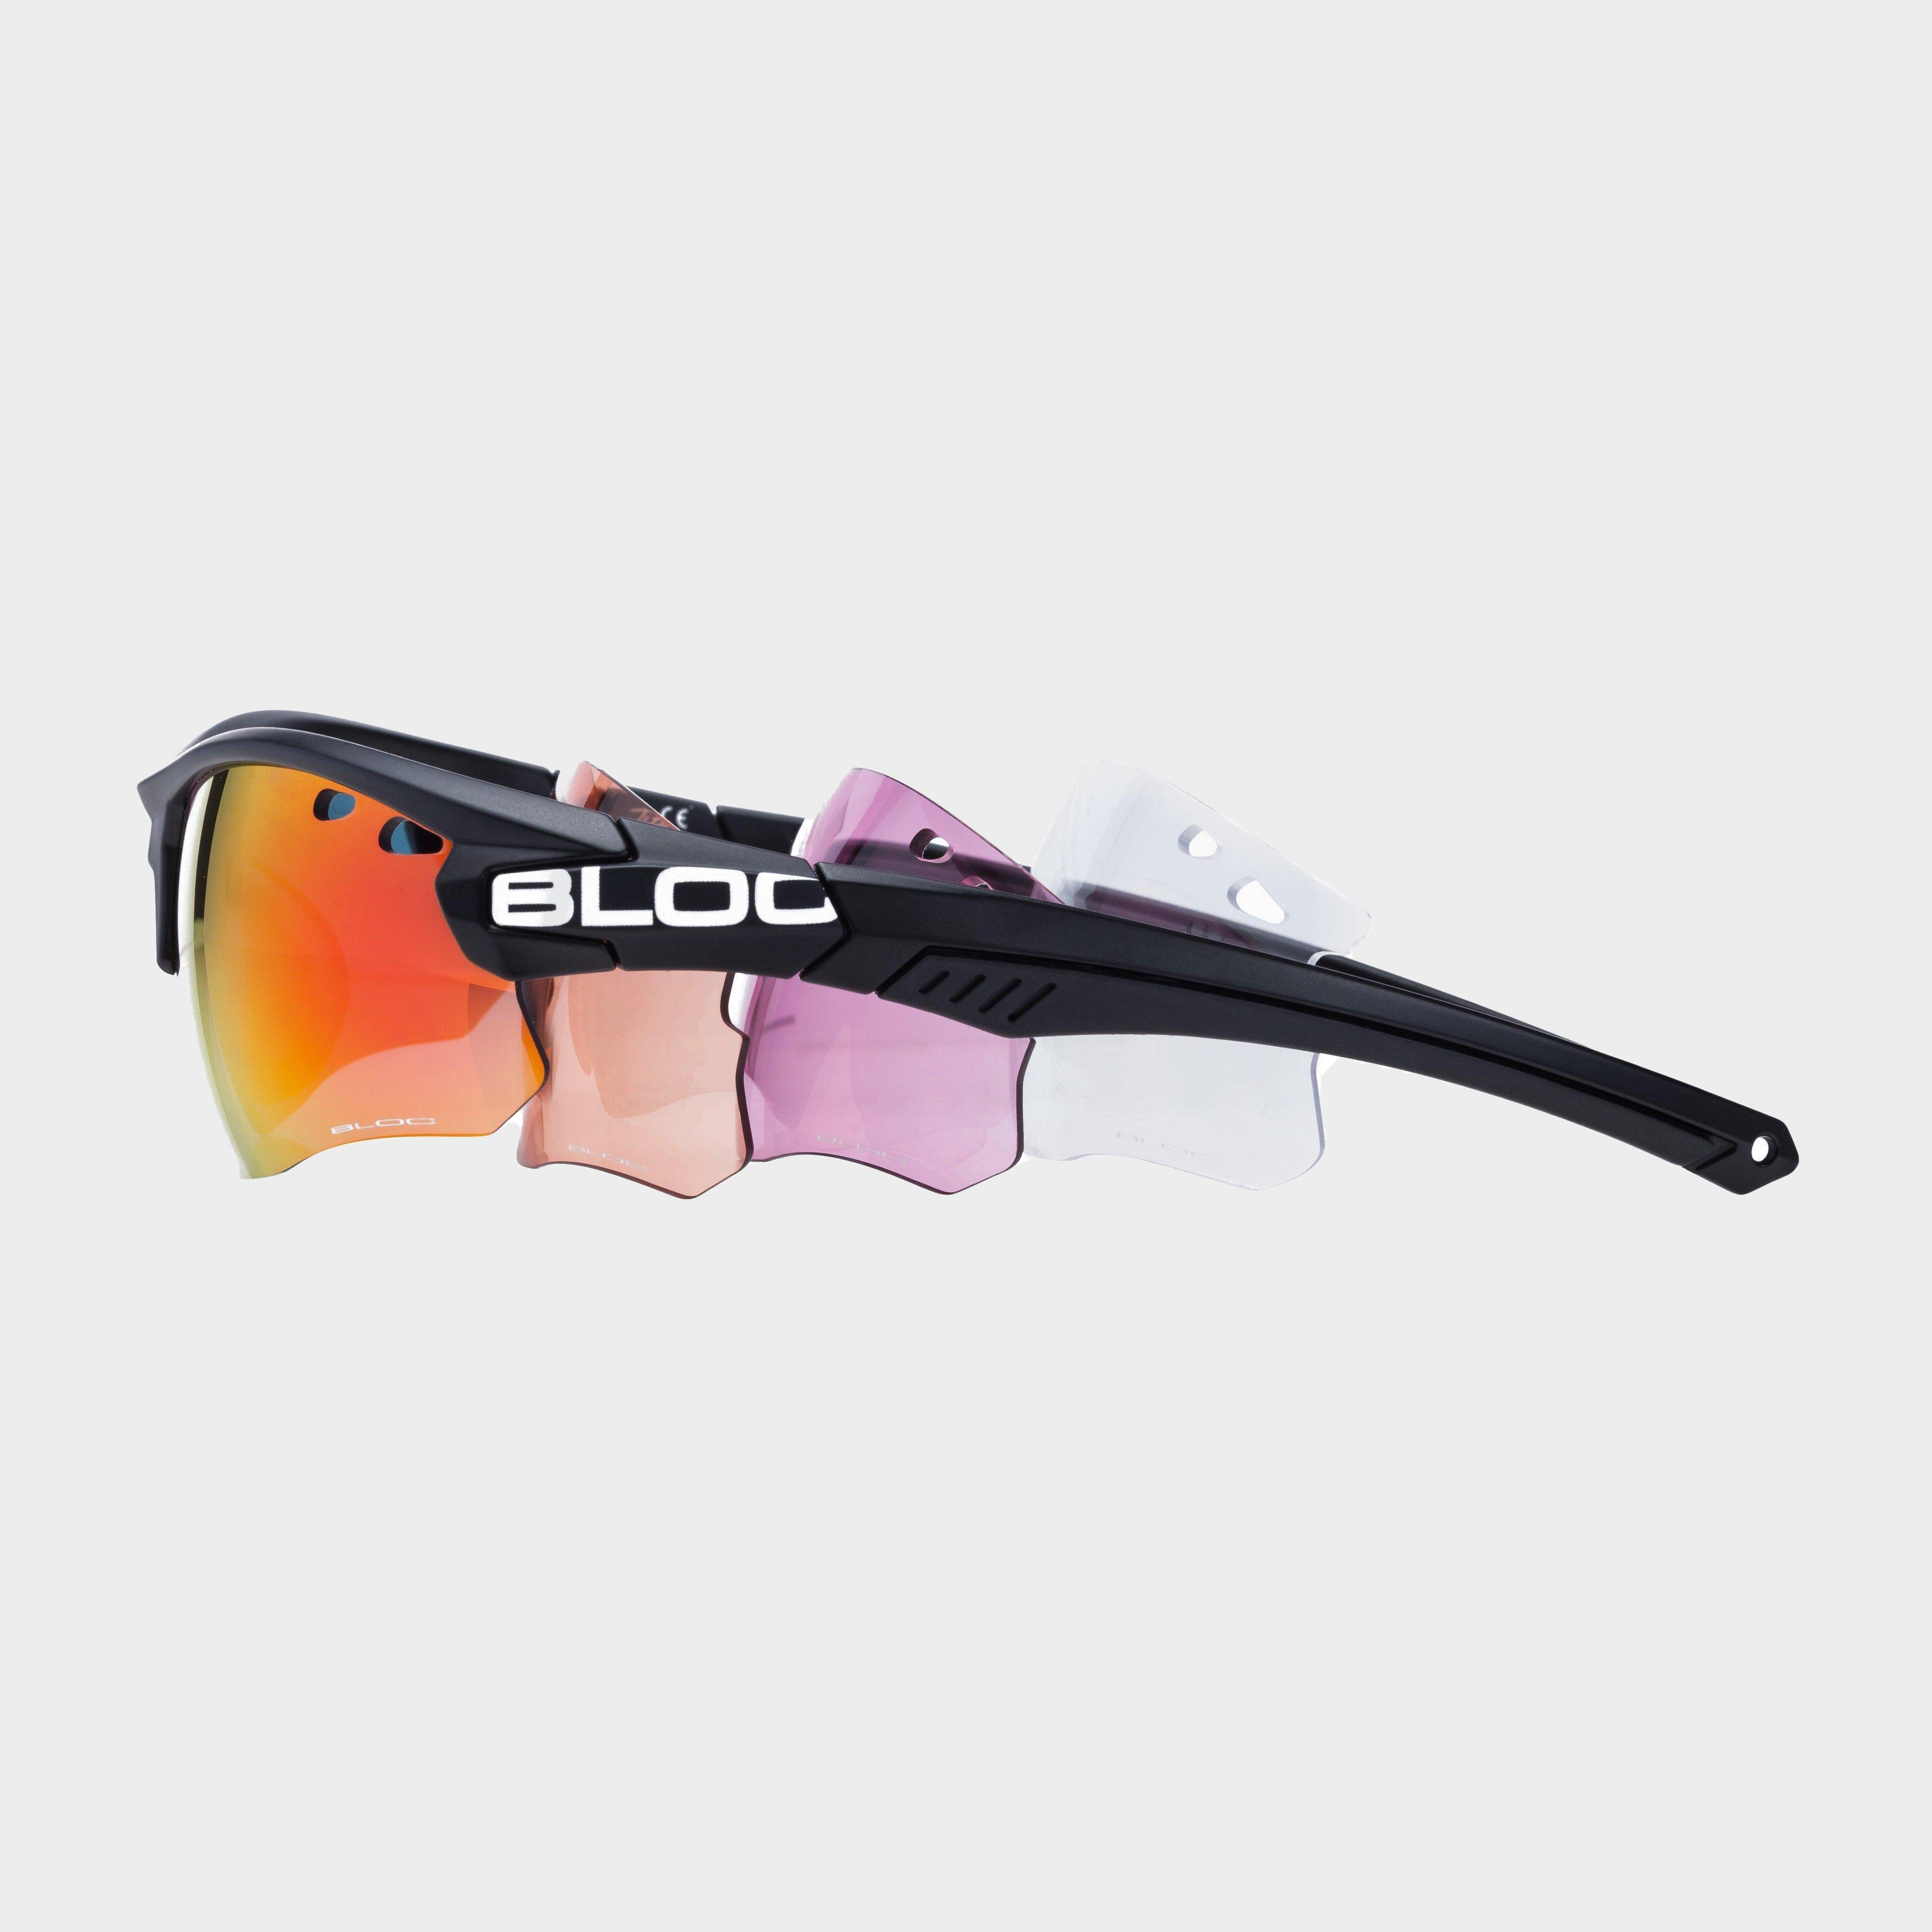 Bloc Titan Xr630 Sunglasses - Black  Black